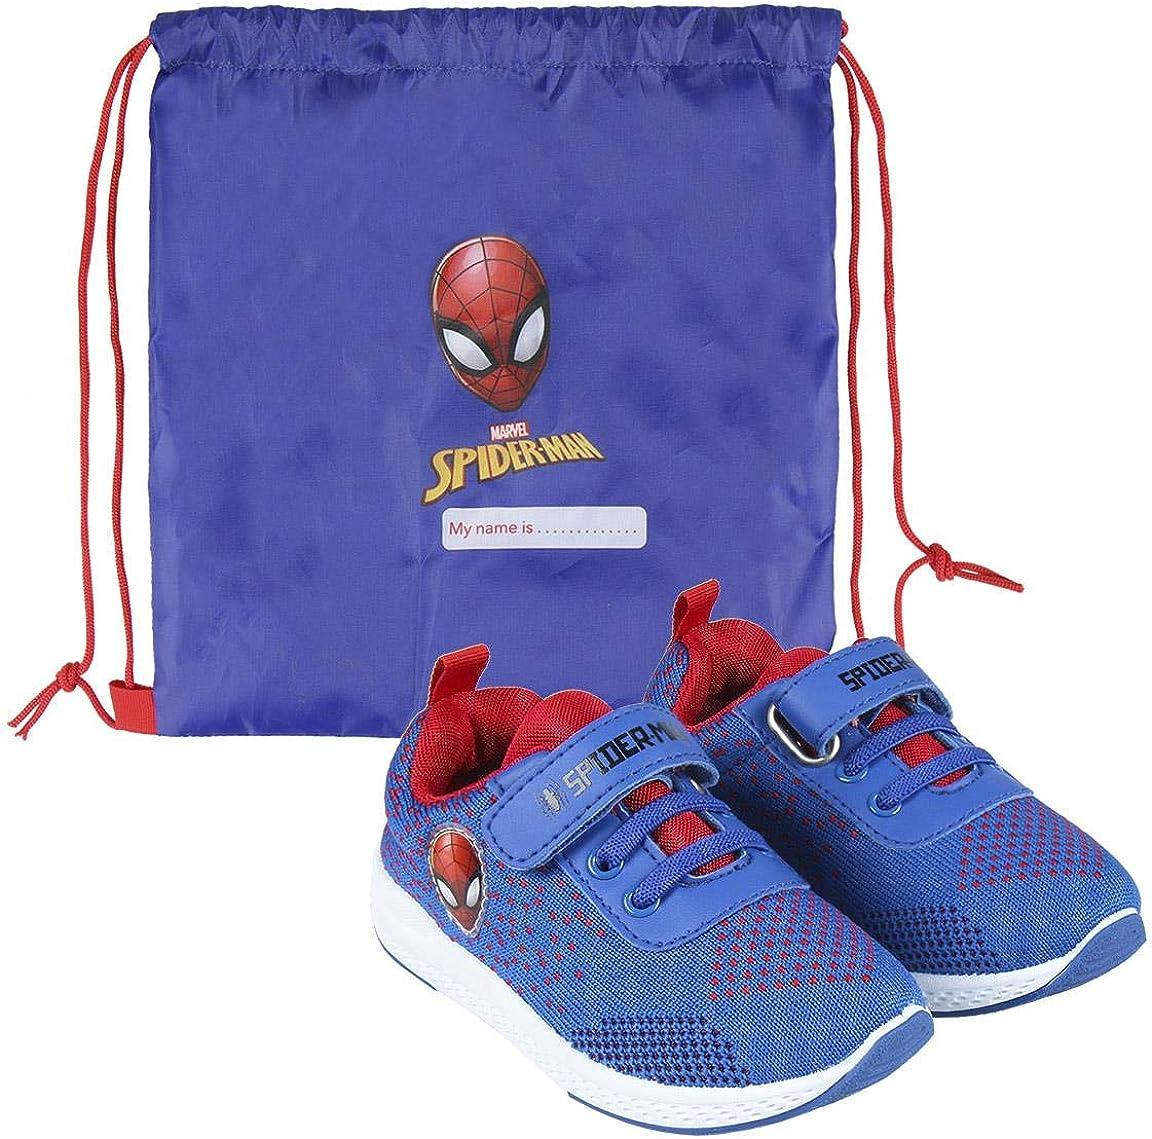 CERD/Á LIFES LITTLE MOMENTS Cerd/á-Zapatillas de Spiderman para Ni/ños de Color Azul